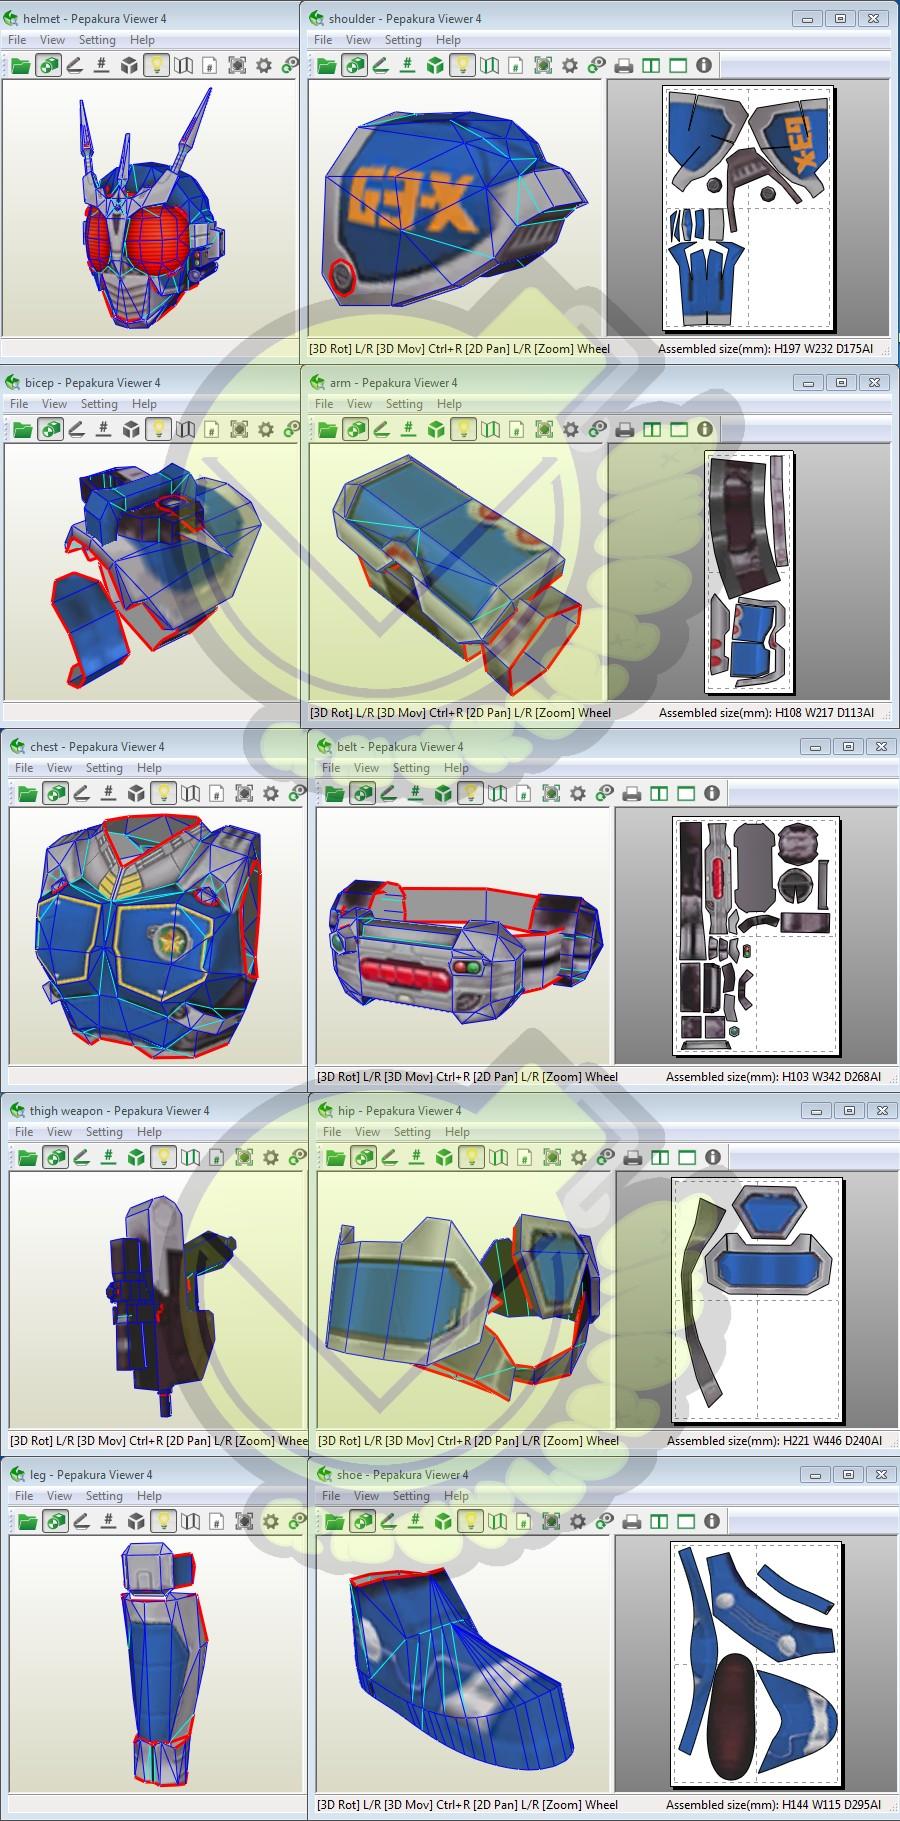 Ichigo Papercraft Kamen Rider G3x Costume Template Pattern Pepakura 3d Model